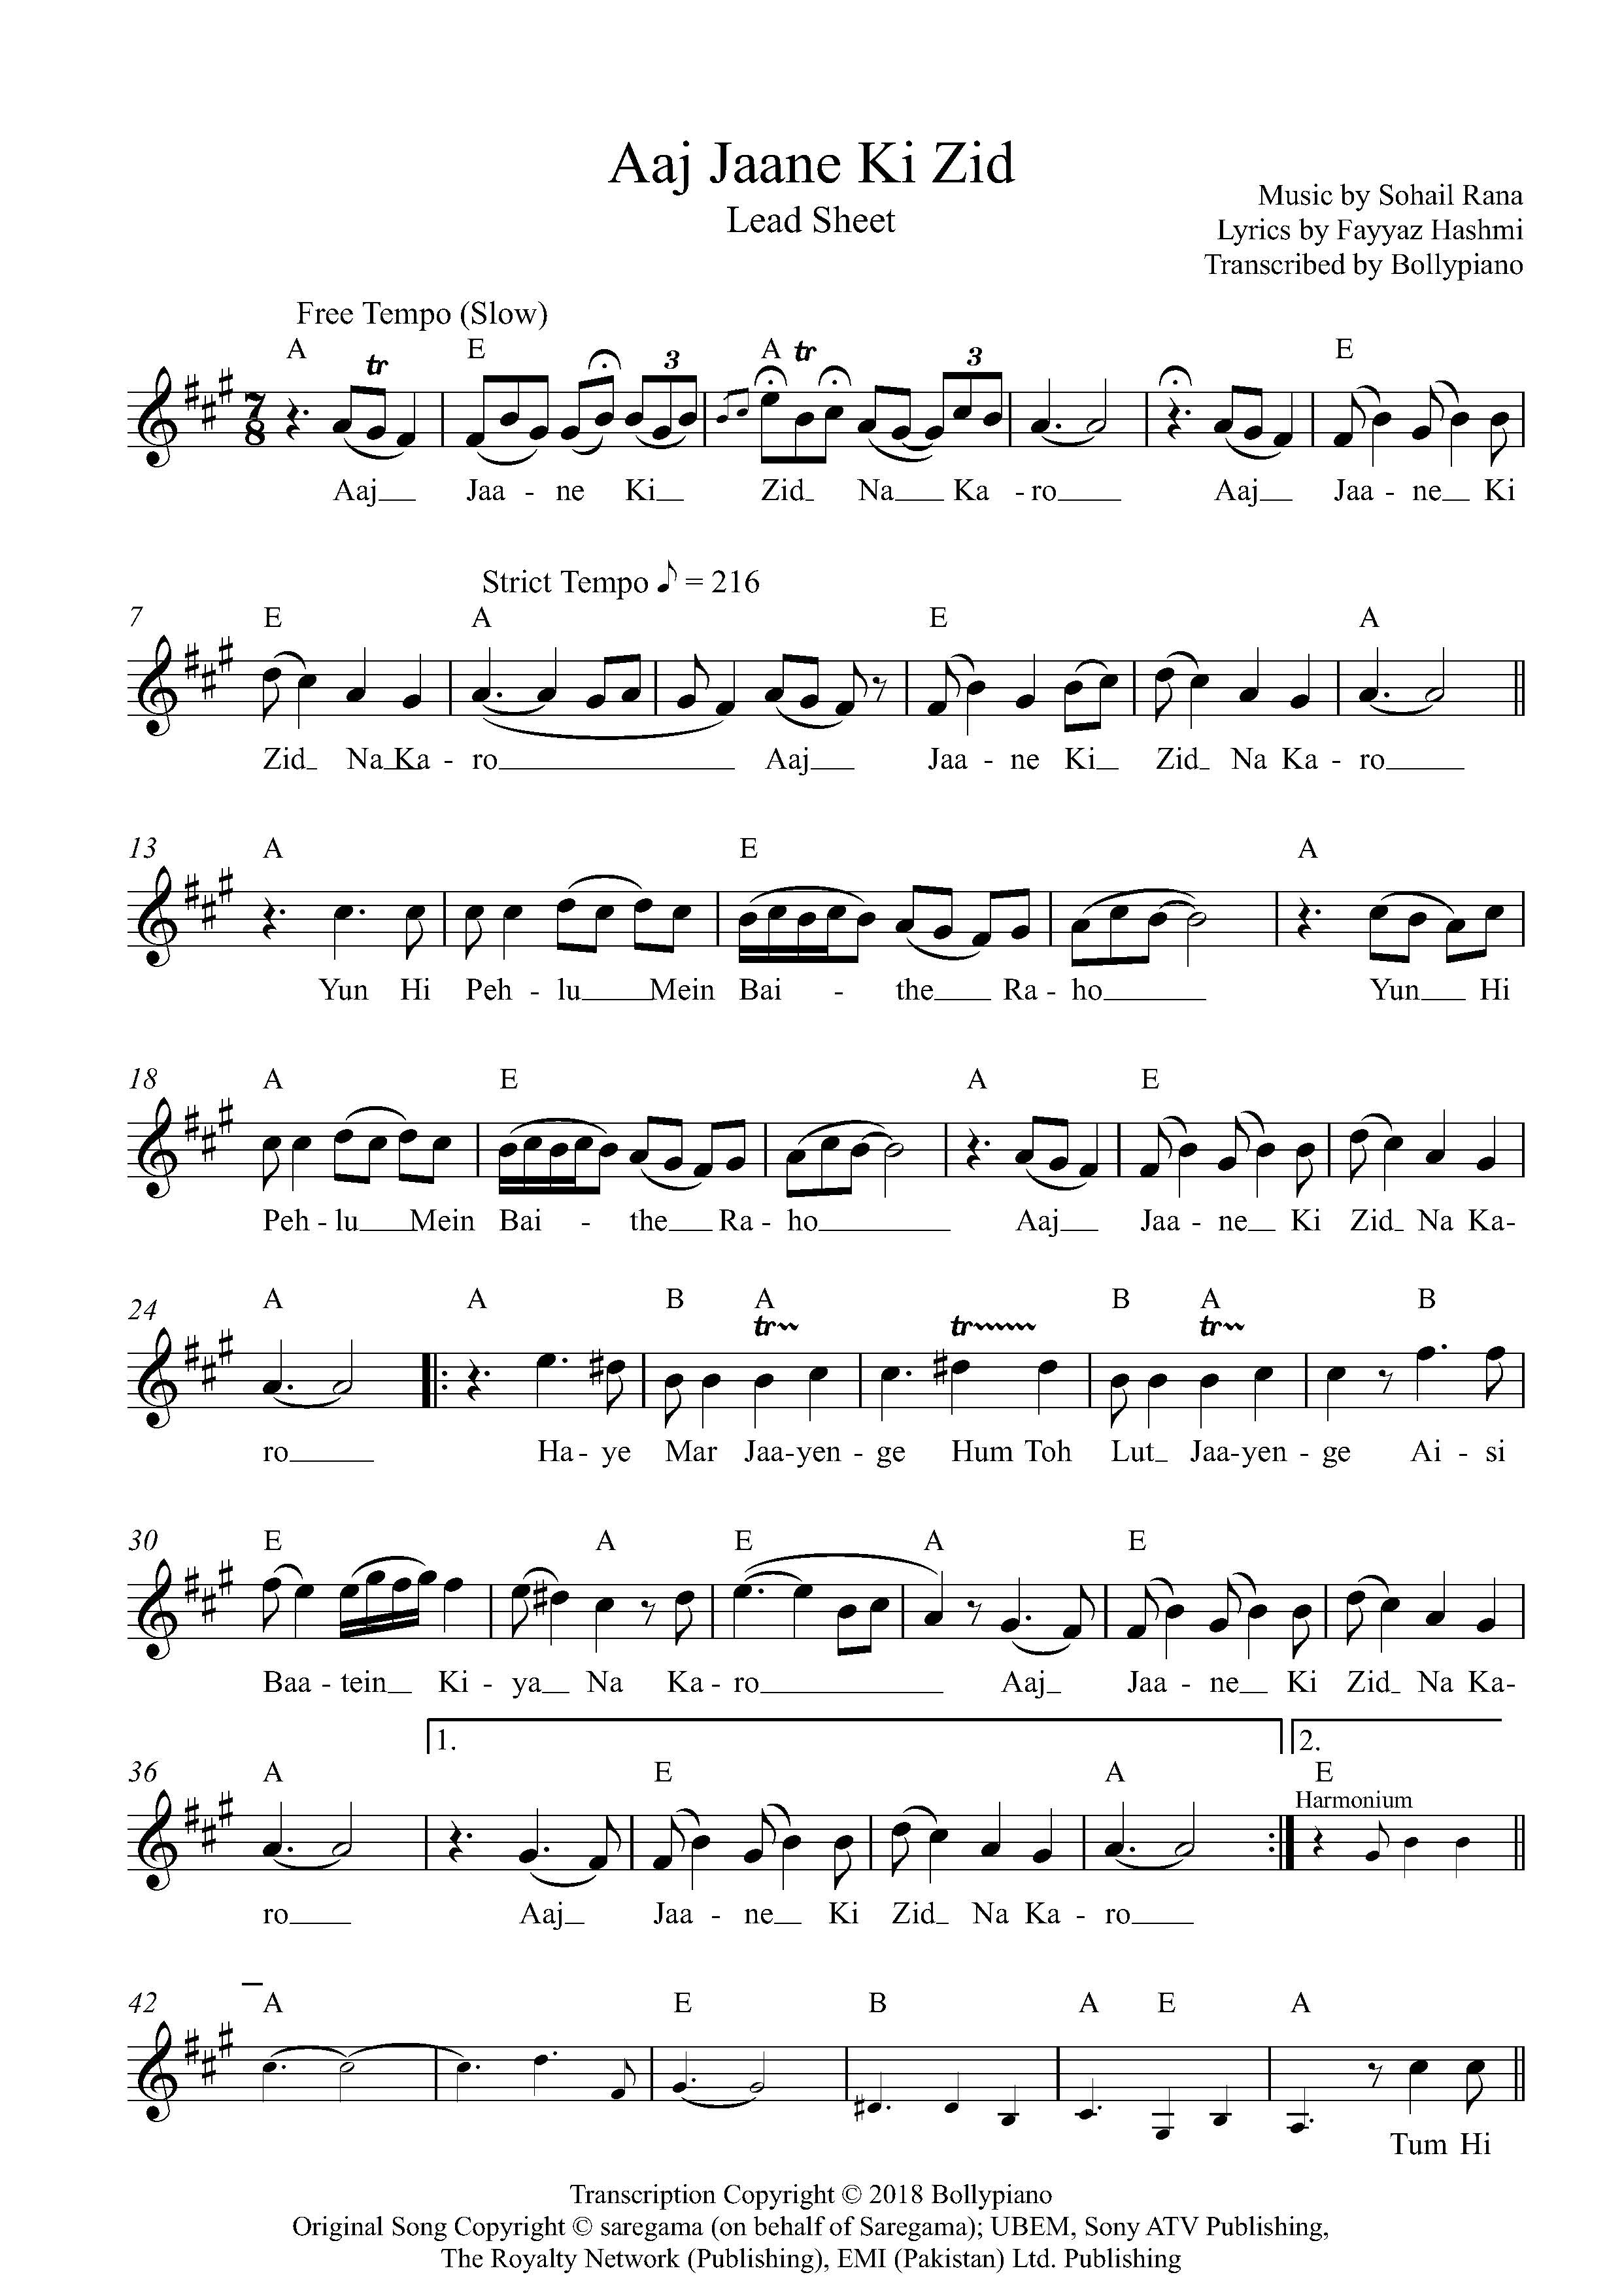 Aaj Jaane Ki Zid Flute Violin Notes Lead Sheet Music Pdf Besharam bewaffa song sargam notes in hindi i lyrics i jagjit singh is available on sangeetbook. aaj jaane ki zid flute violin notes lead sheet music pdf